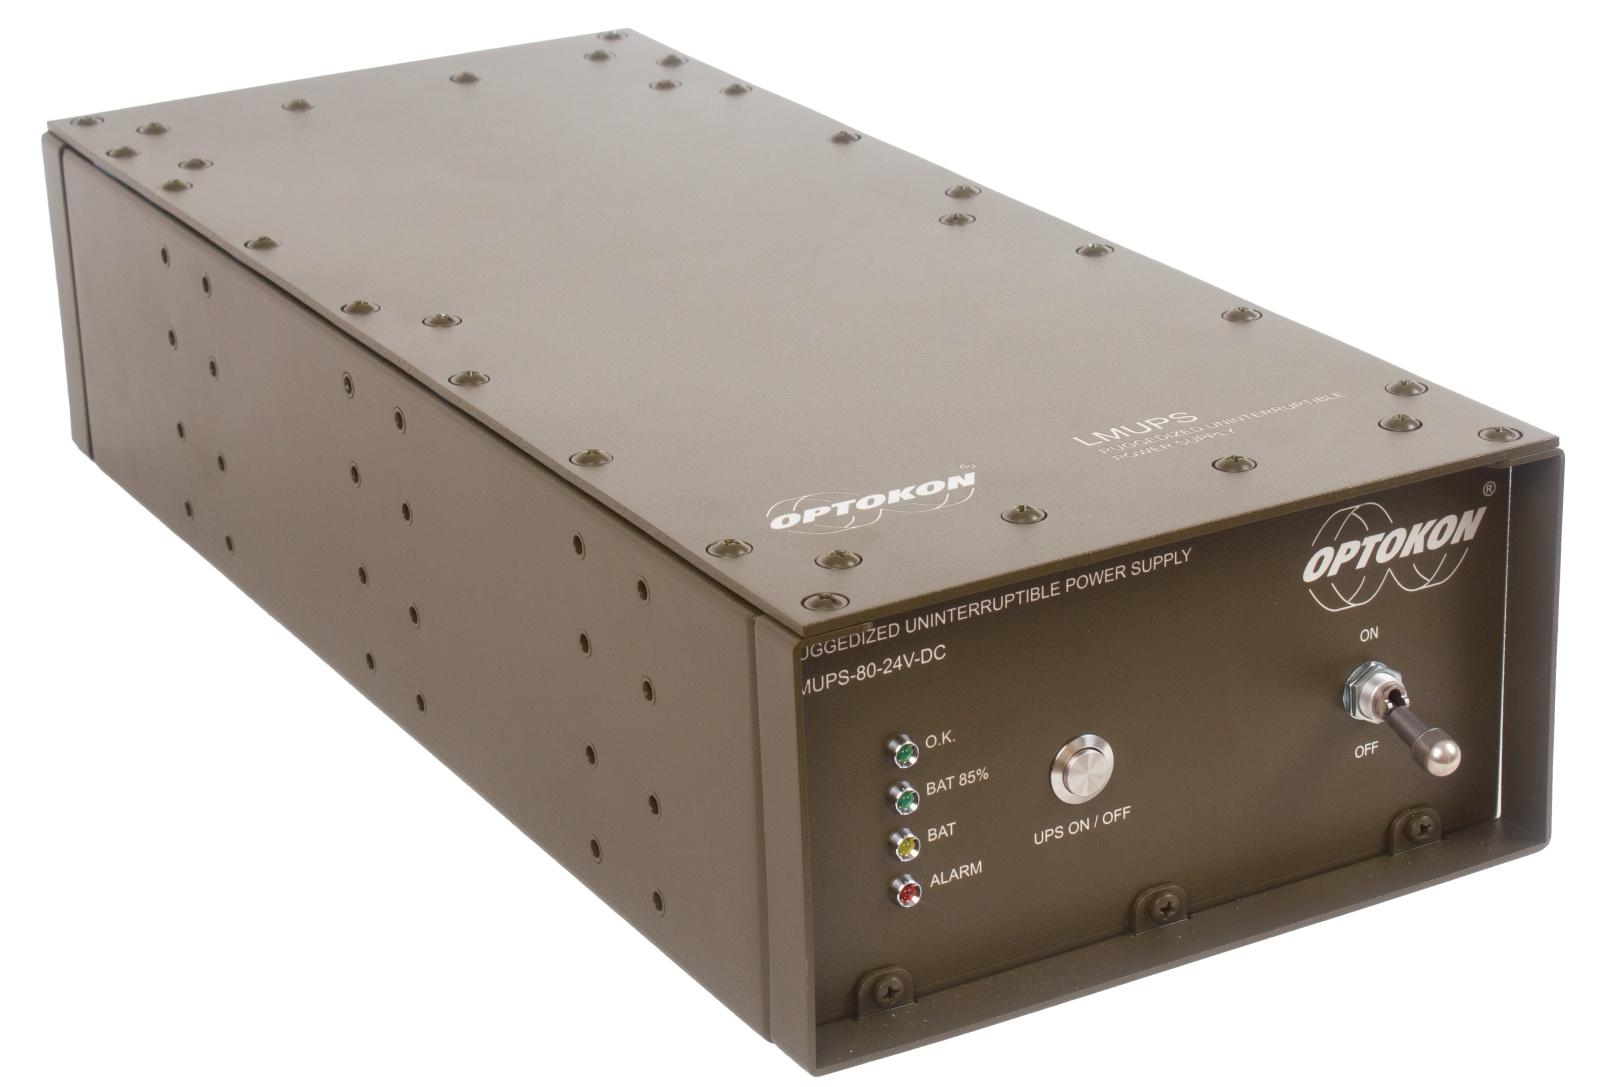 LMUPS-80-24V Ruggedized Uninterruptible Power Supply